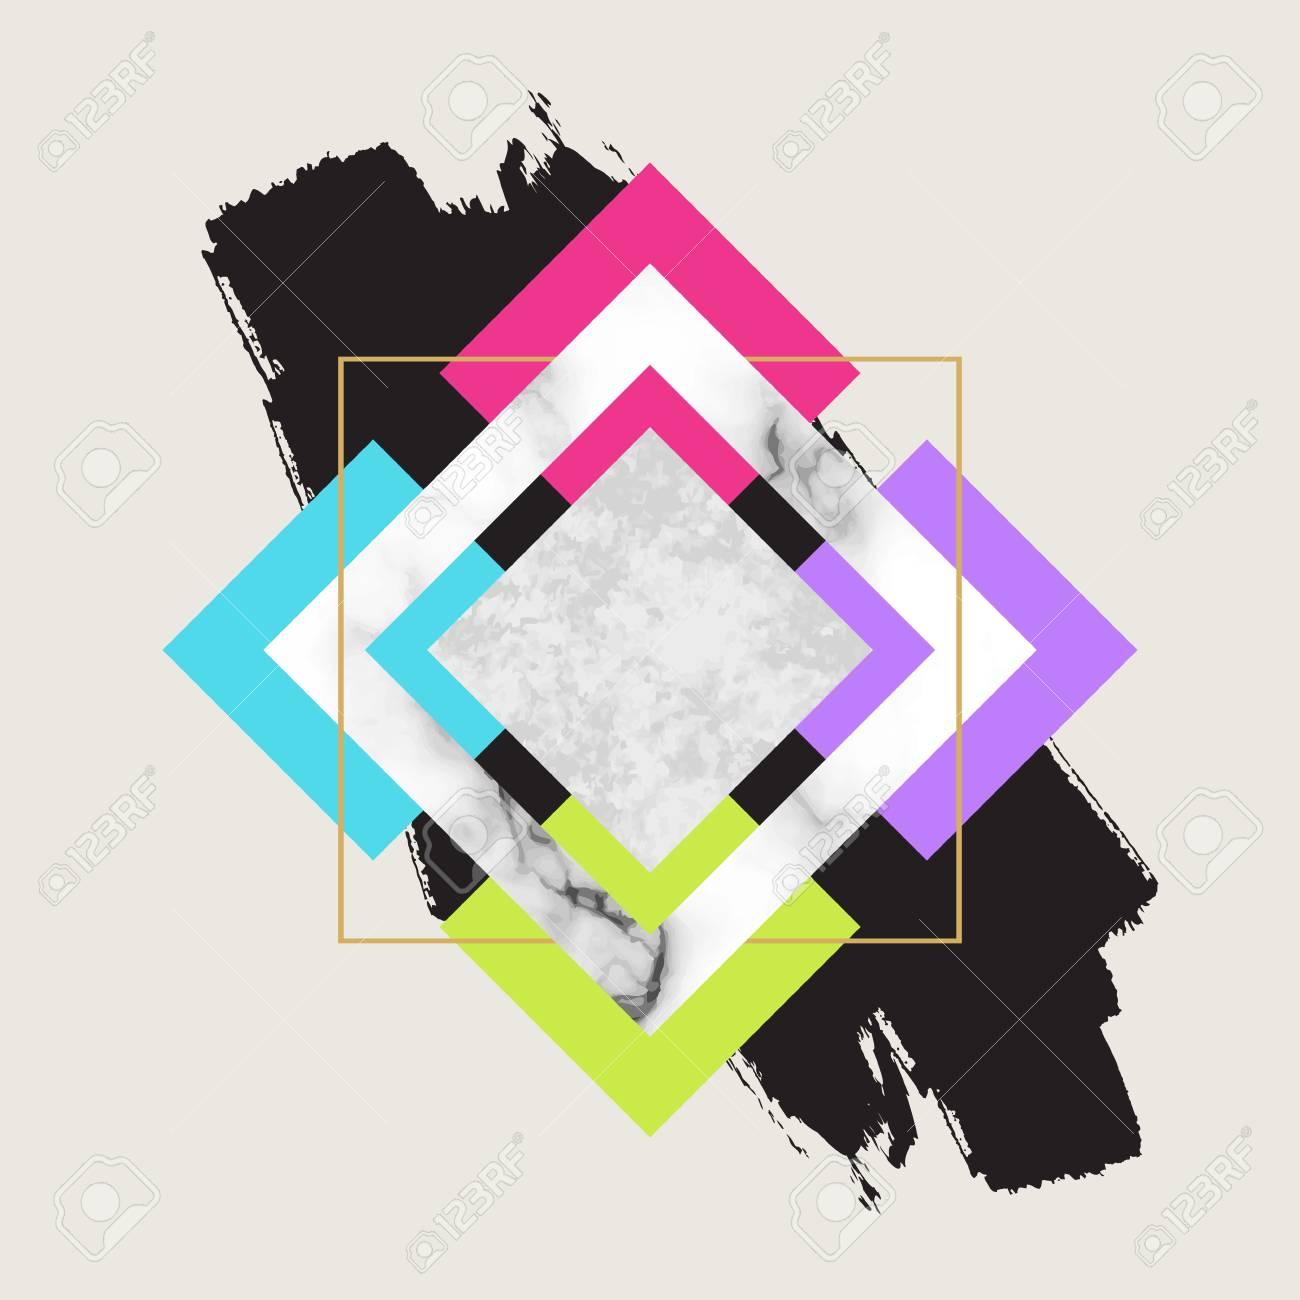 Vector Fondo Geométrico De Moda. Diseño Escandinavo Moderno Para ...